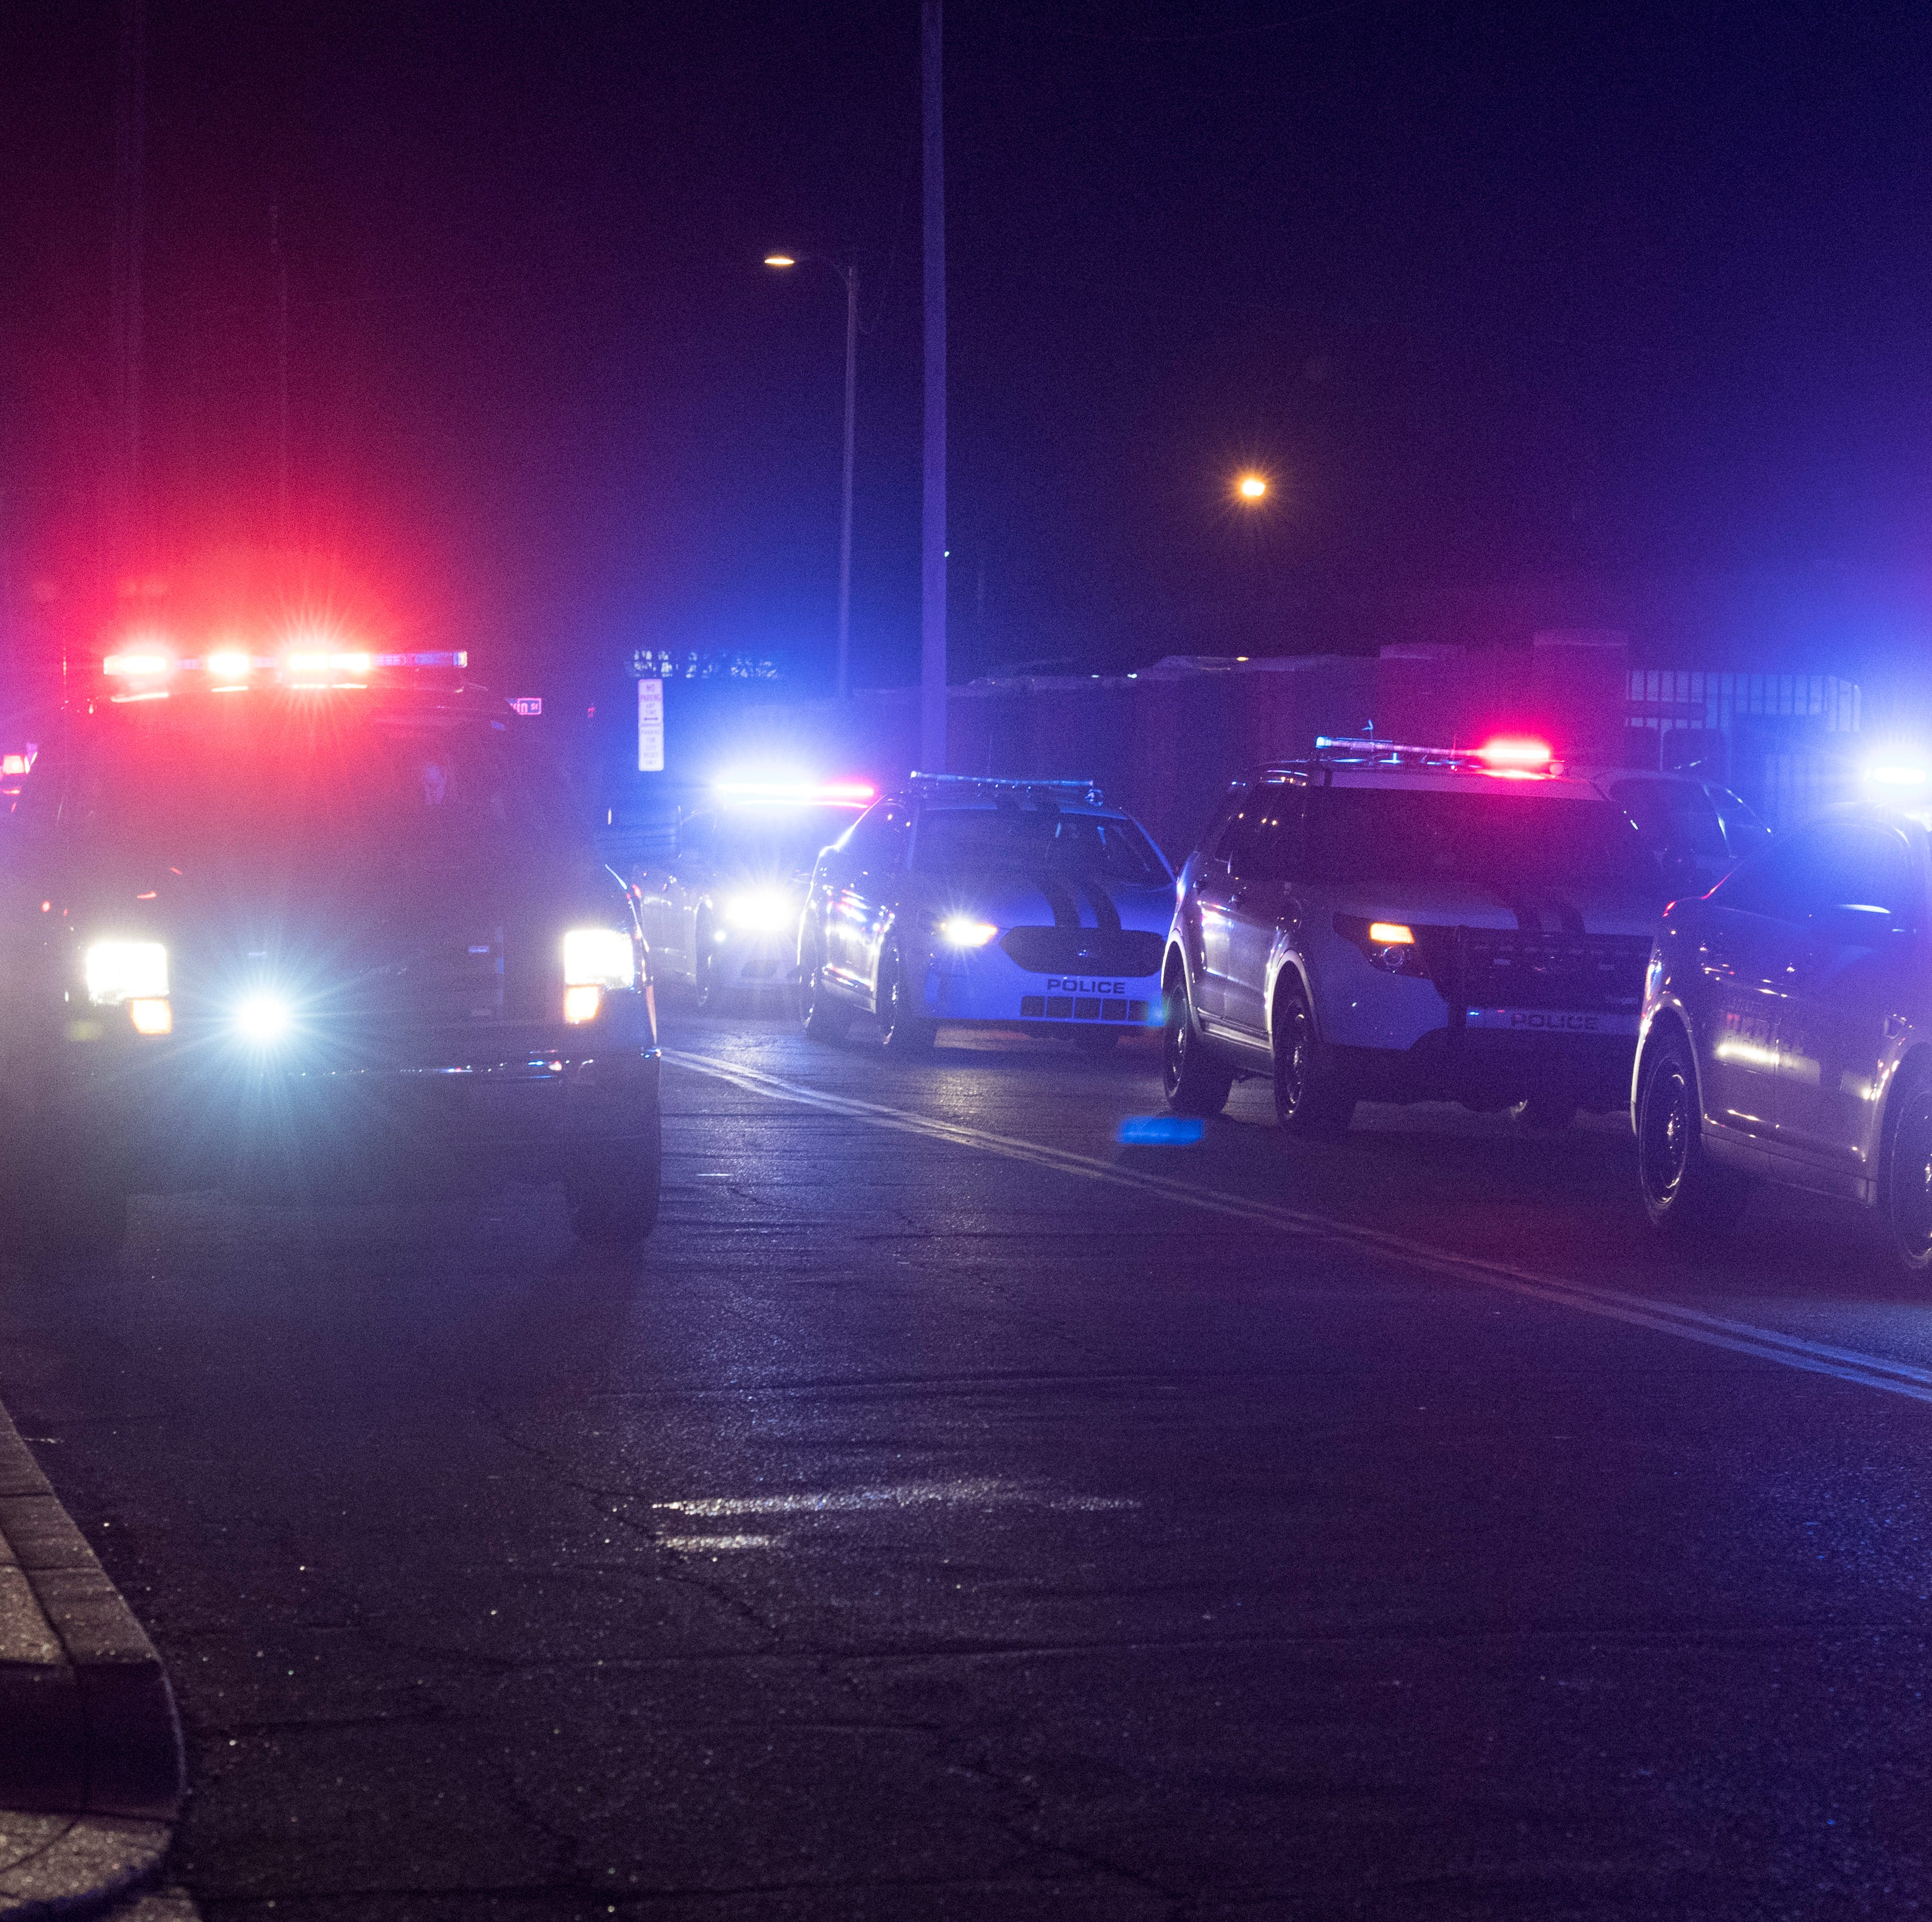 Autopsy: Evansville firefighter Robert Doerr killed by gunshot wound